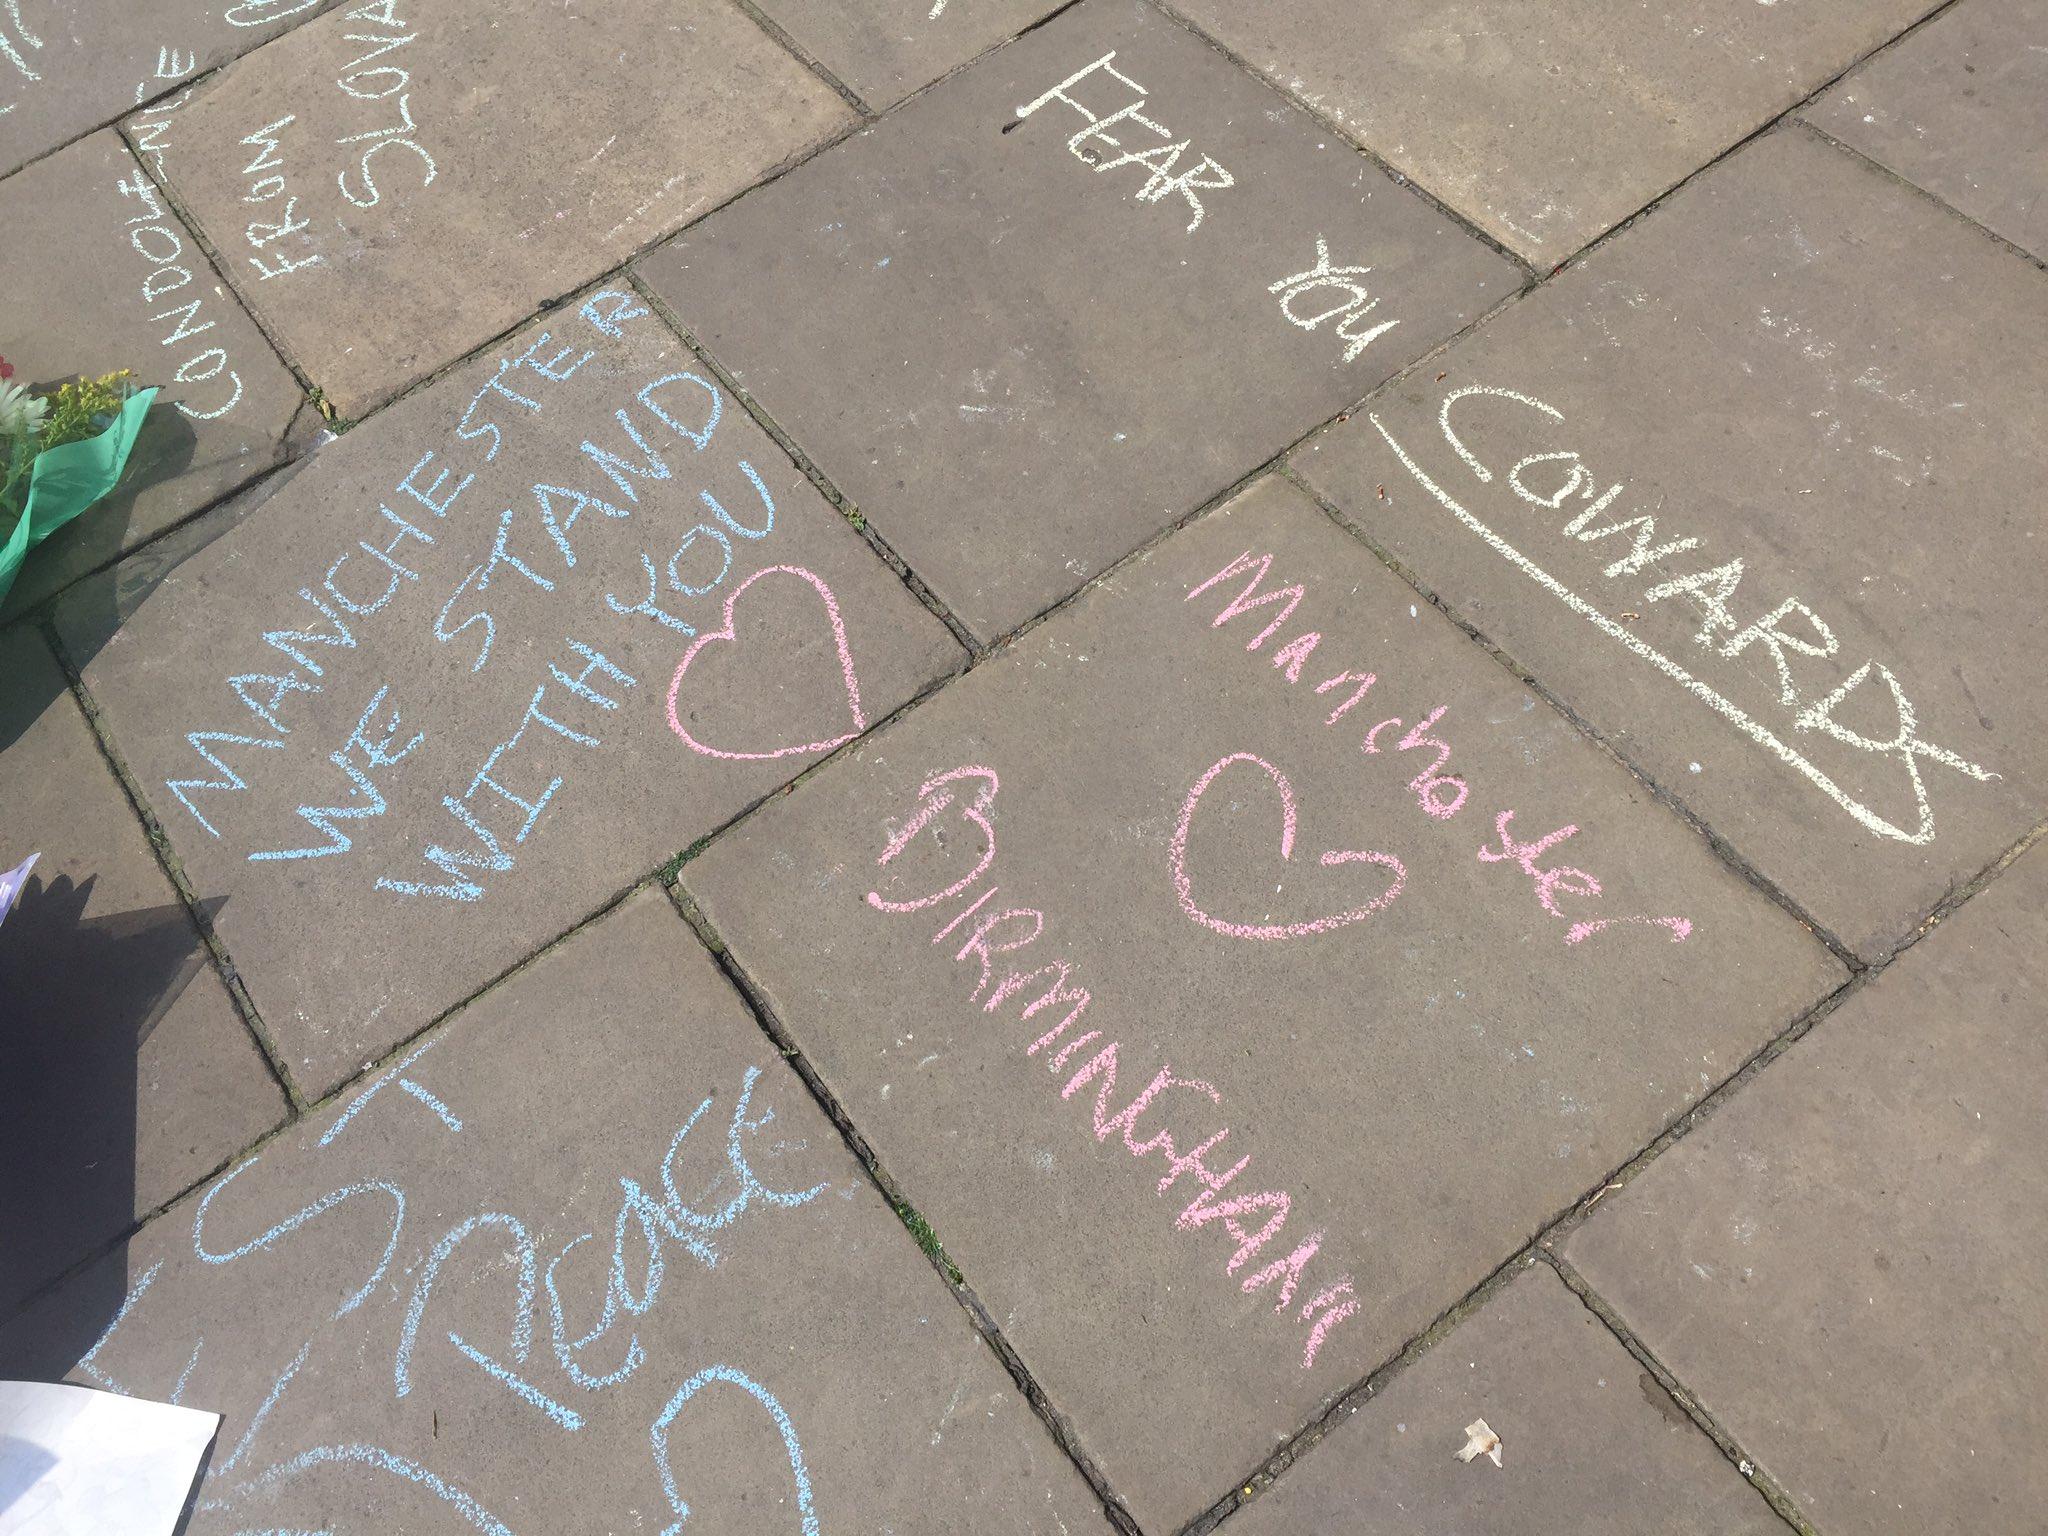 Birmingham Manchester vigil